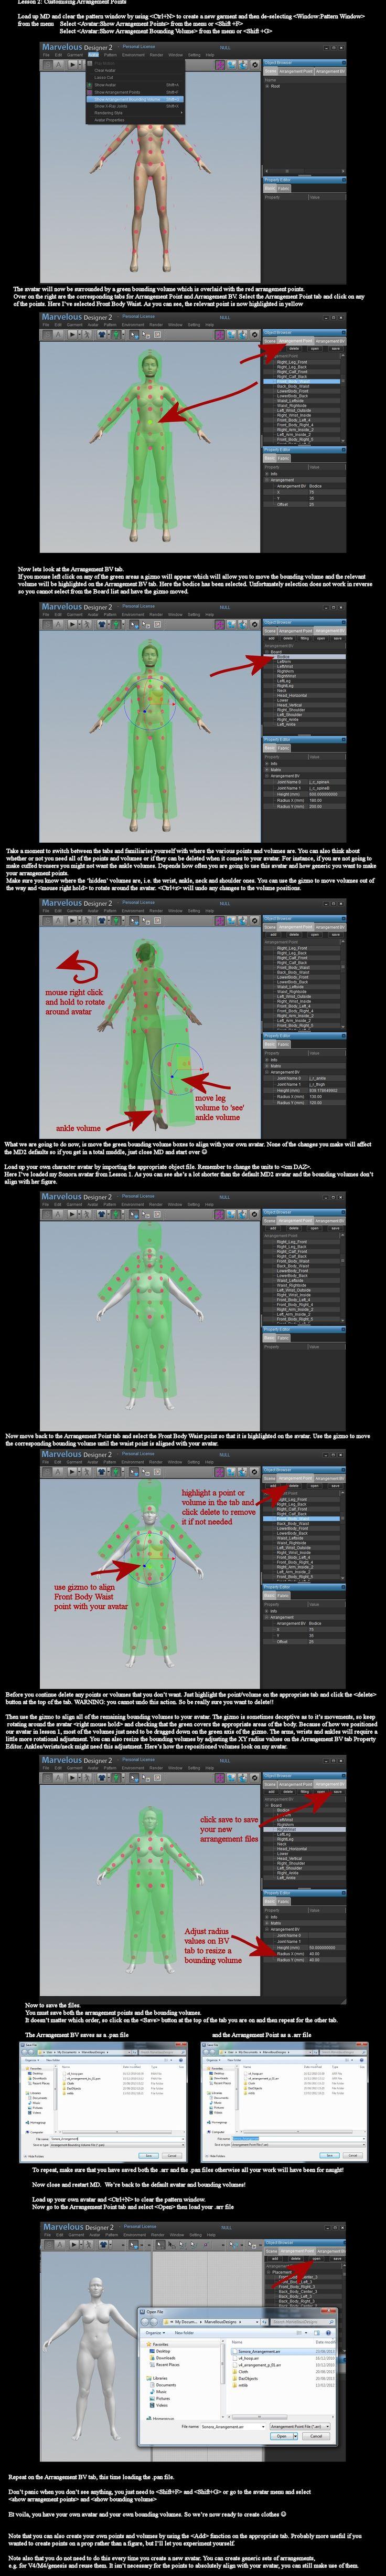 MD2 and DAZ Studio: Creating Arrangement Points by *dylazuna on deviantART